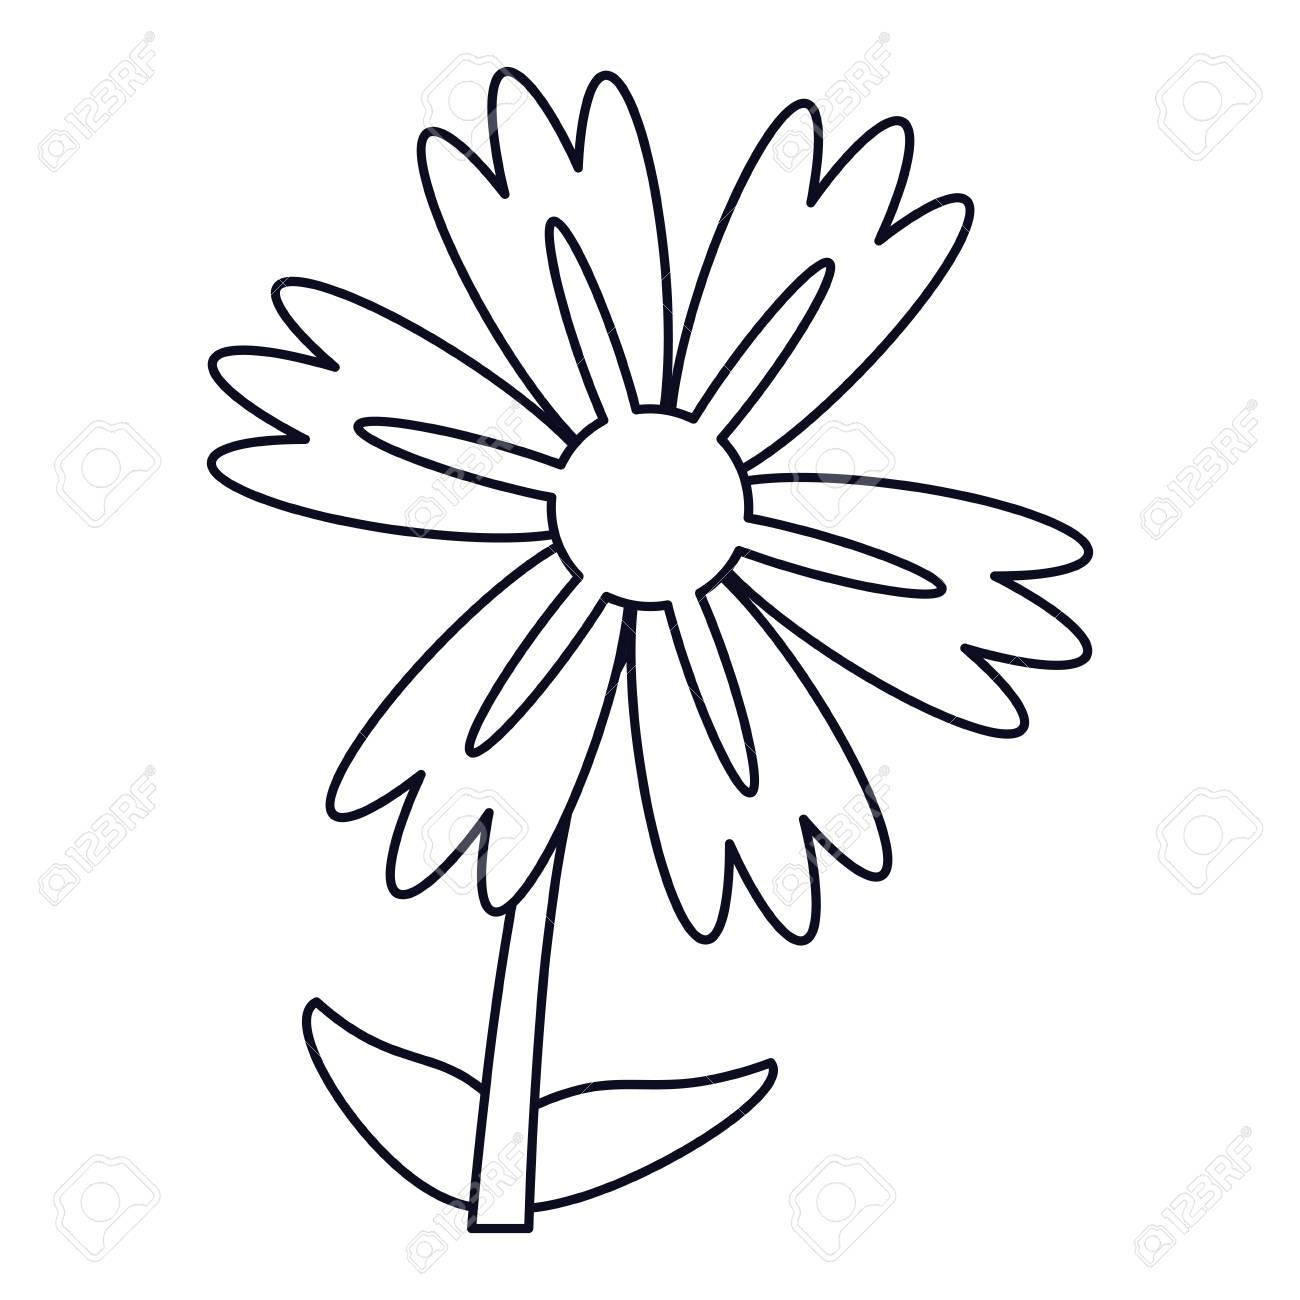 Lily Flower Natural Outline Vector Illustration Eps 10 Royalty Free